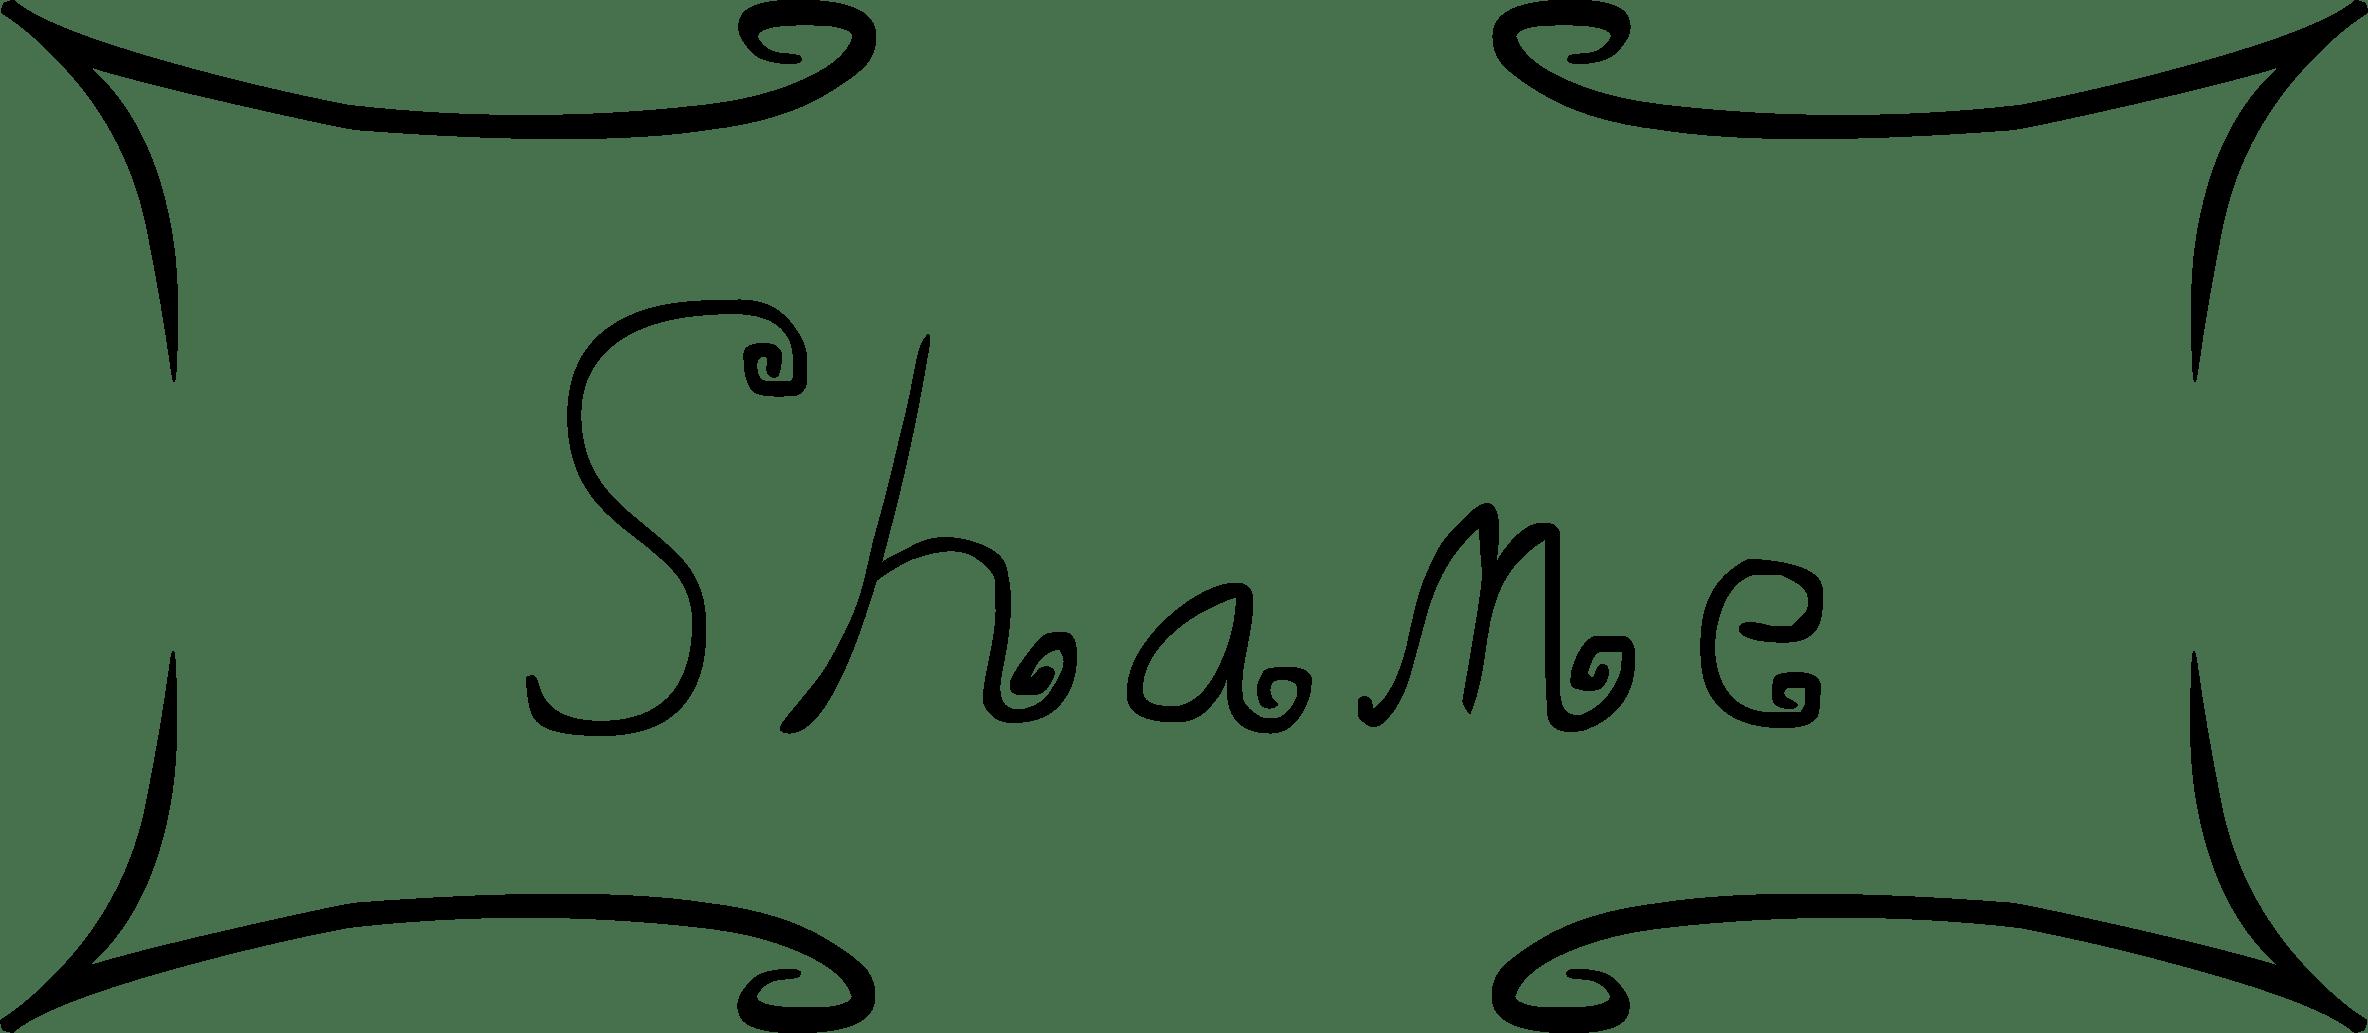 Free Shame Cliparts Download Free Clip Art Free Clip Art